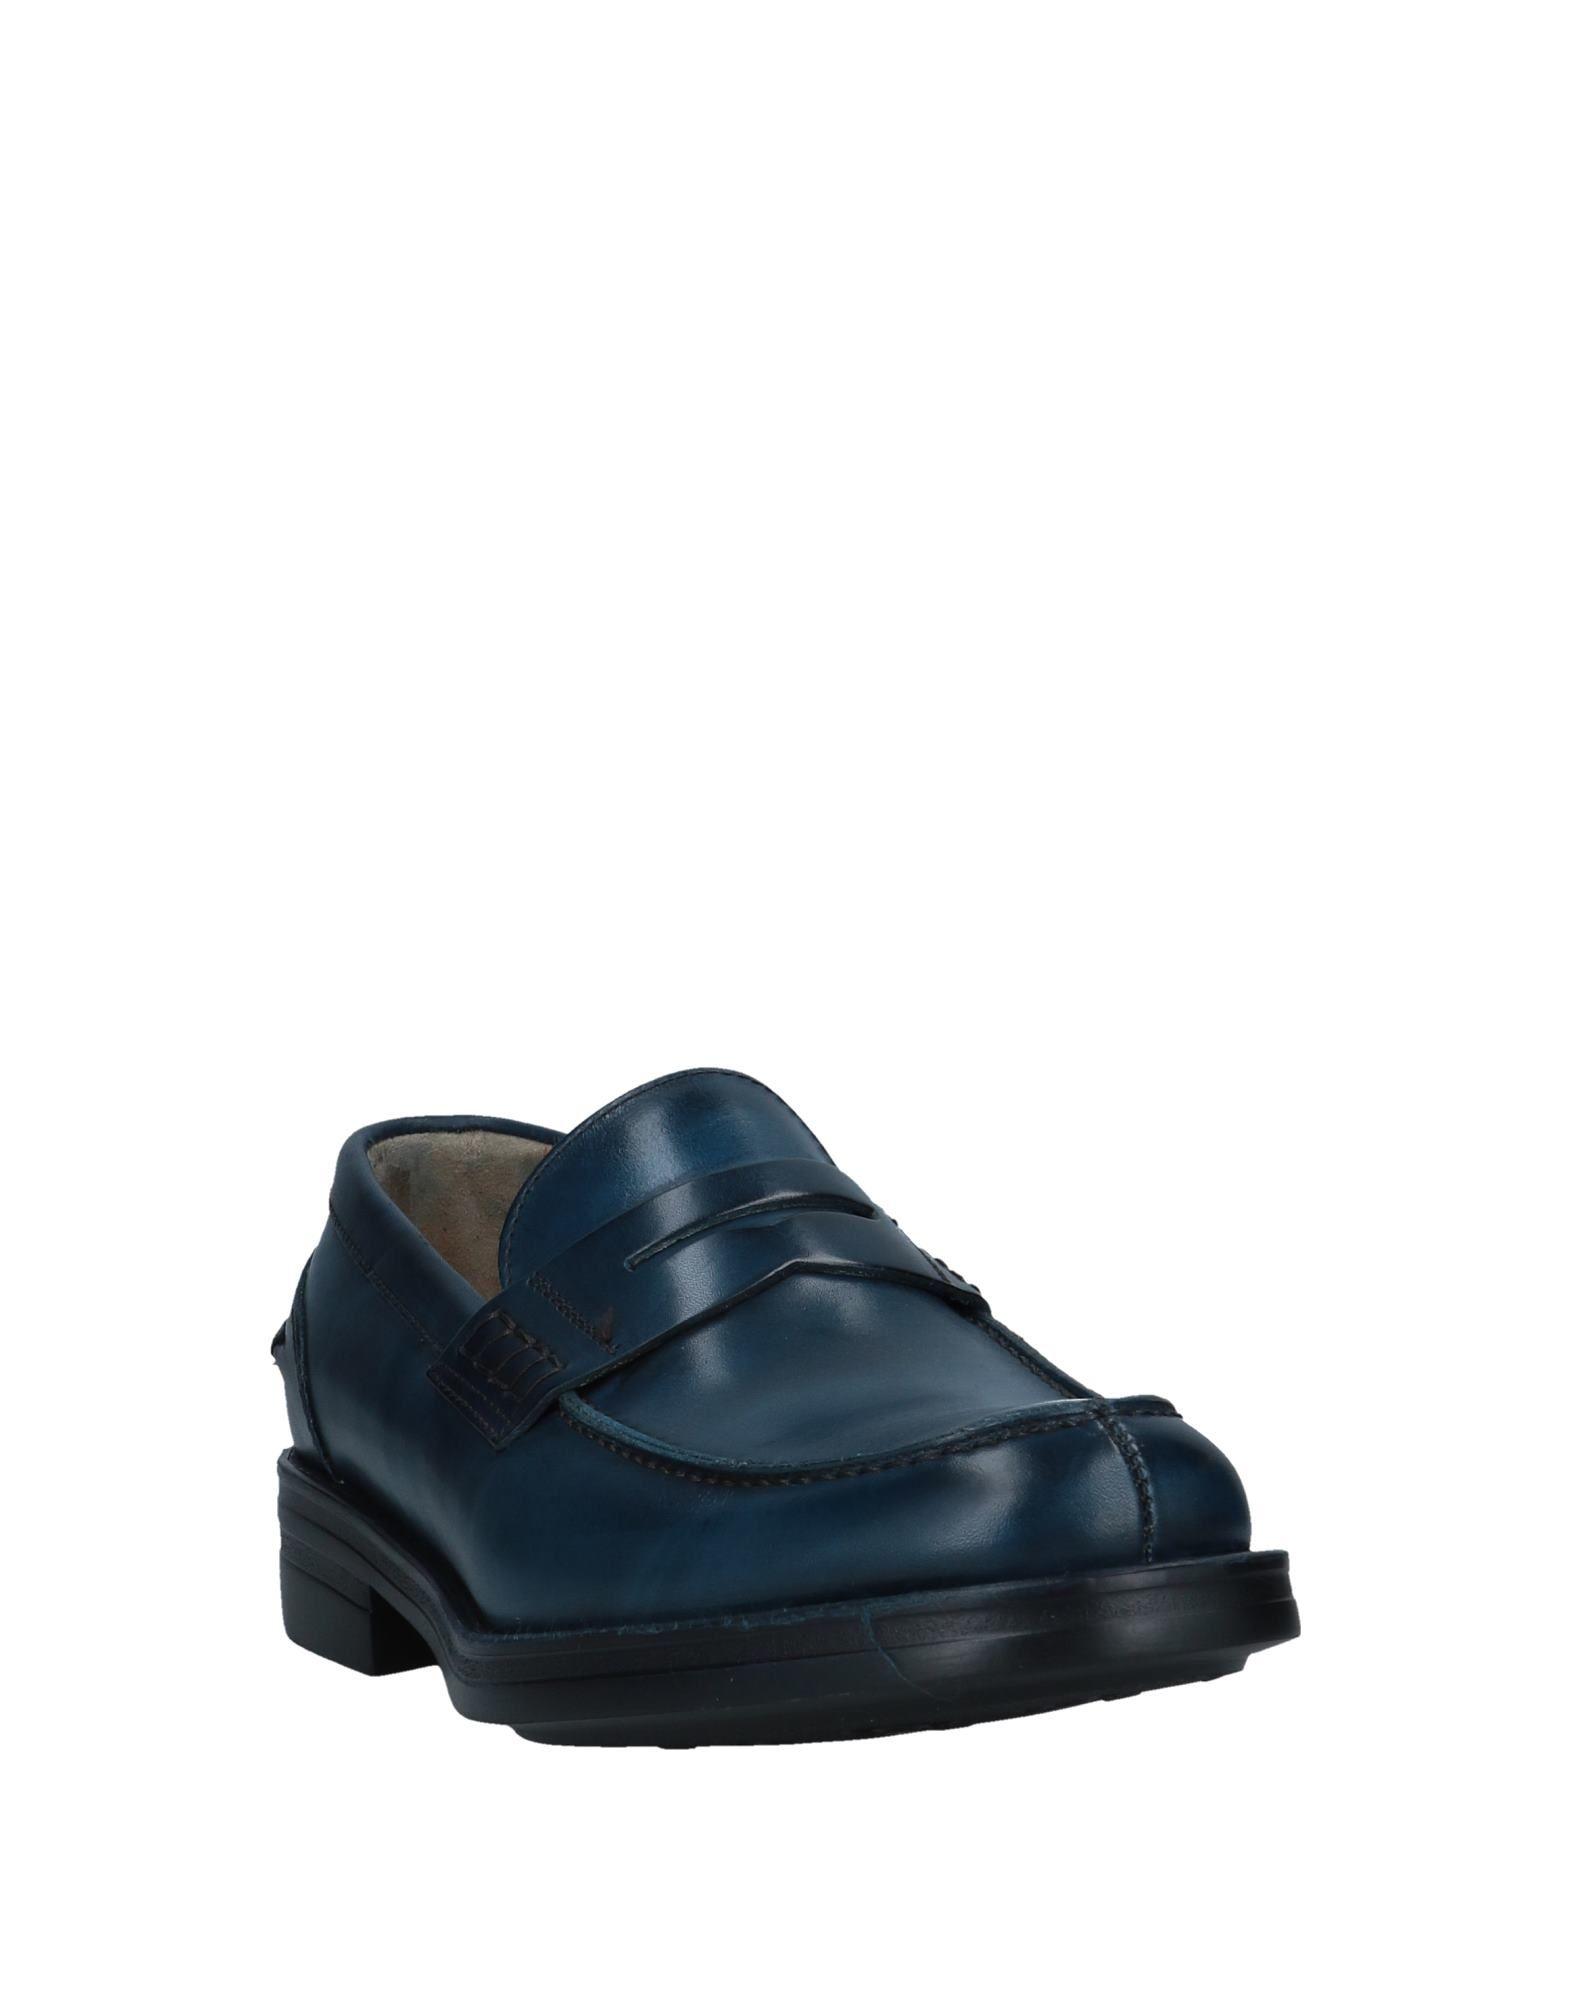 Baldinini Mokassins Qualität Herren  11554908QB Gute Qualität Mokassins beliebte Schuhe 005716